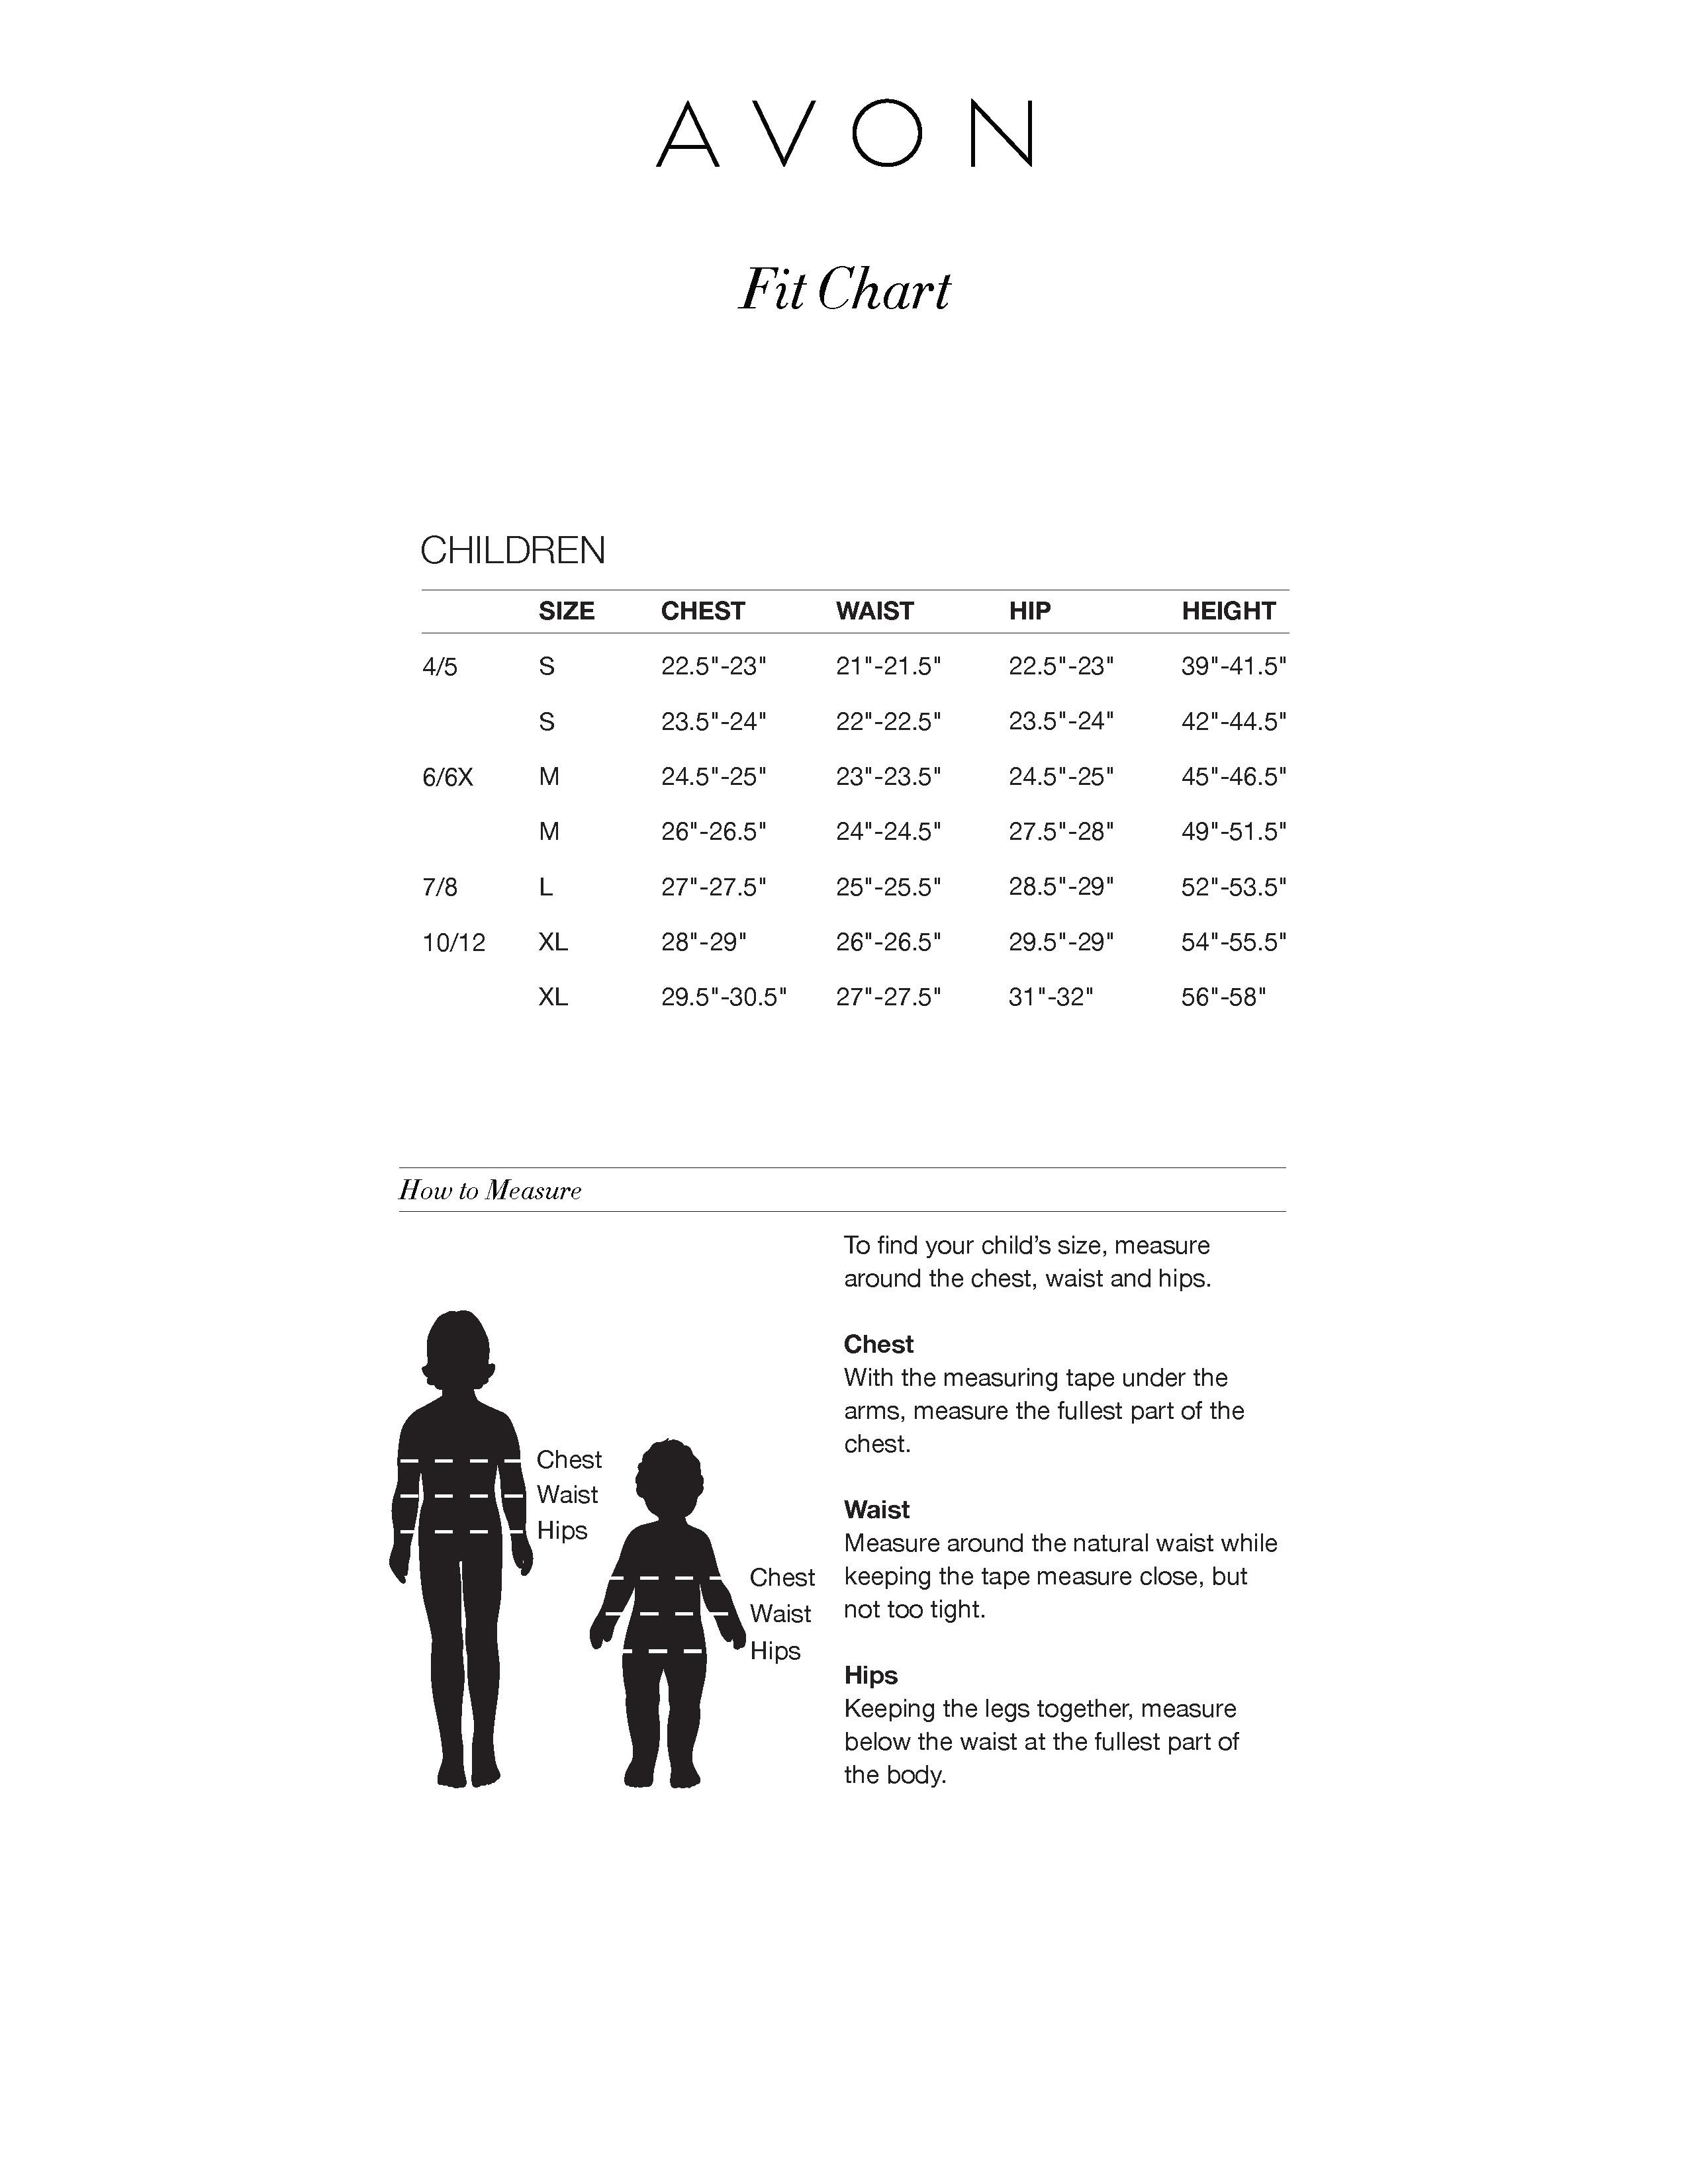 New Avon USA 2018 Childrens Fit Chart